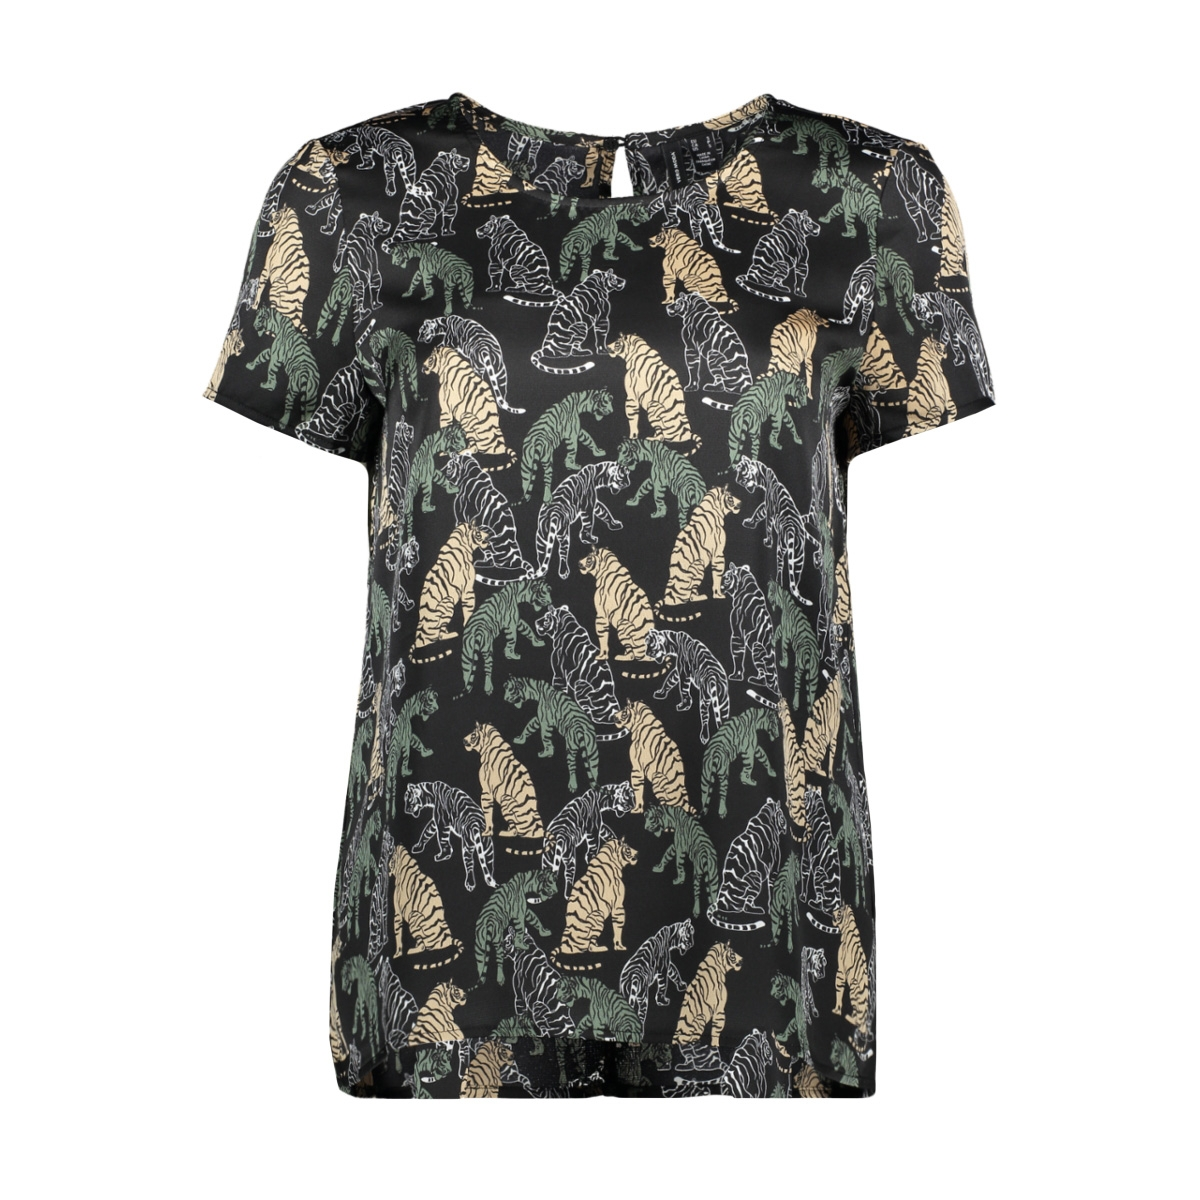 vmlotus s/s top vip 10234734 vero moda t-shirt nomad/lotus